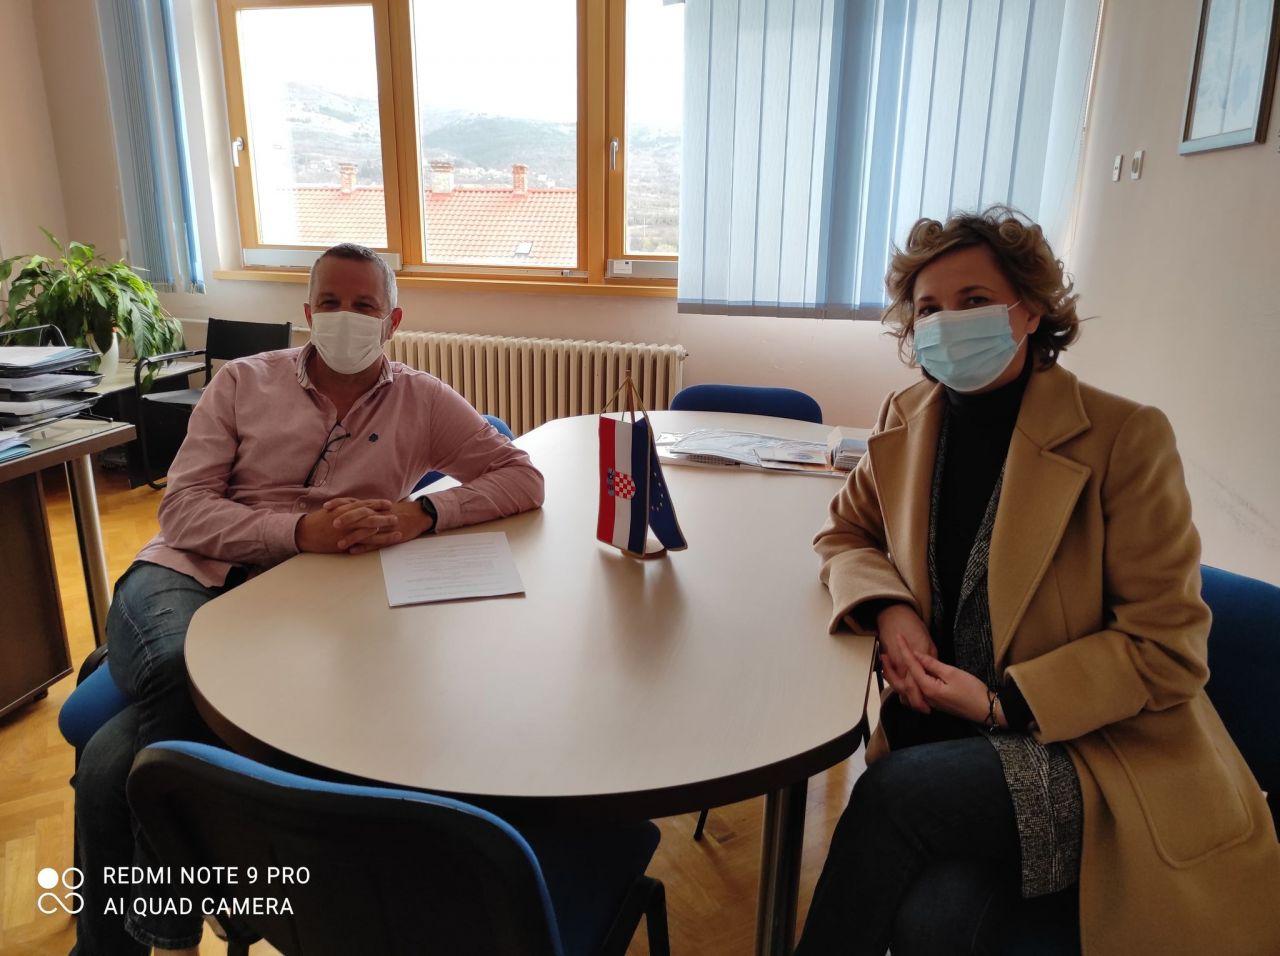 Poptpisan Sporazum o suradnji sa Srednjom školom Ivana Meštrovića - Drniš